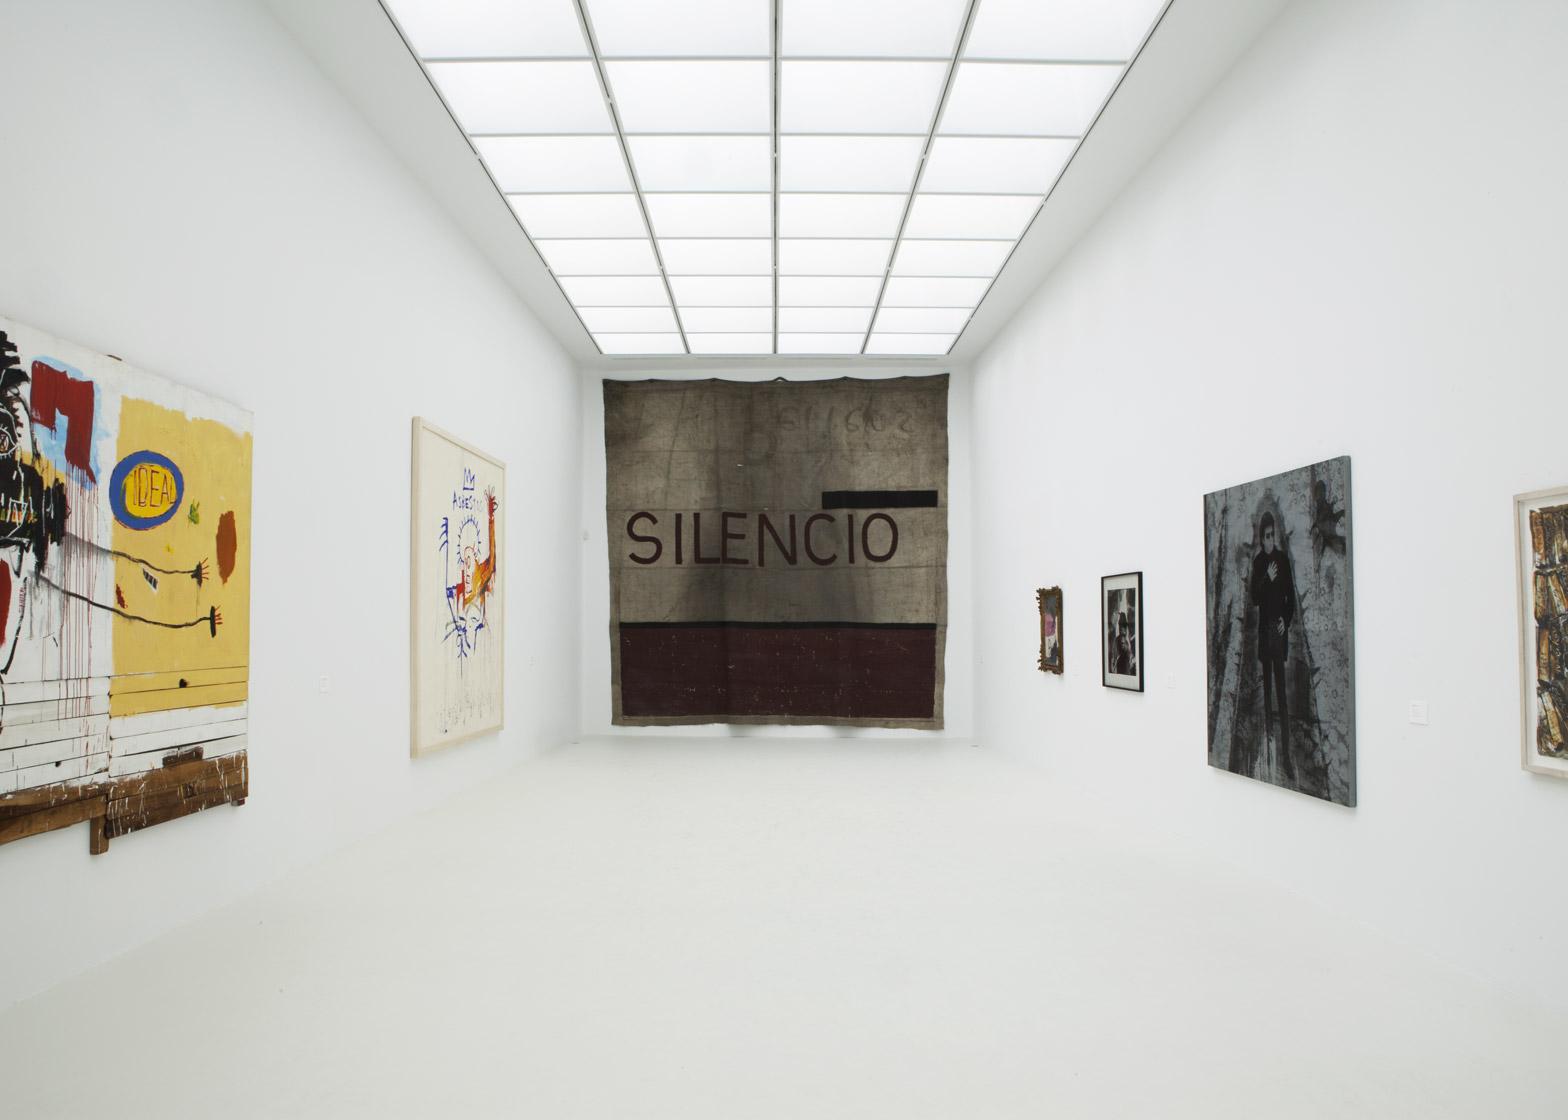 Collection-Lambert-arte-contemporanea-ristrutturazione-berger-berger